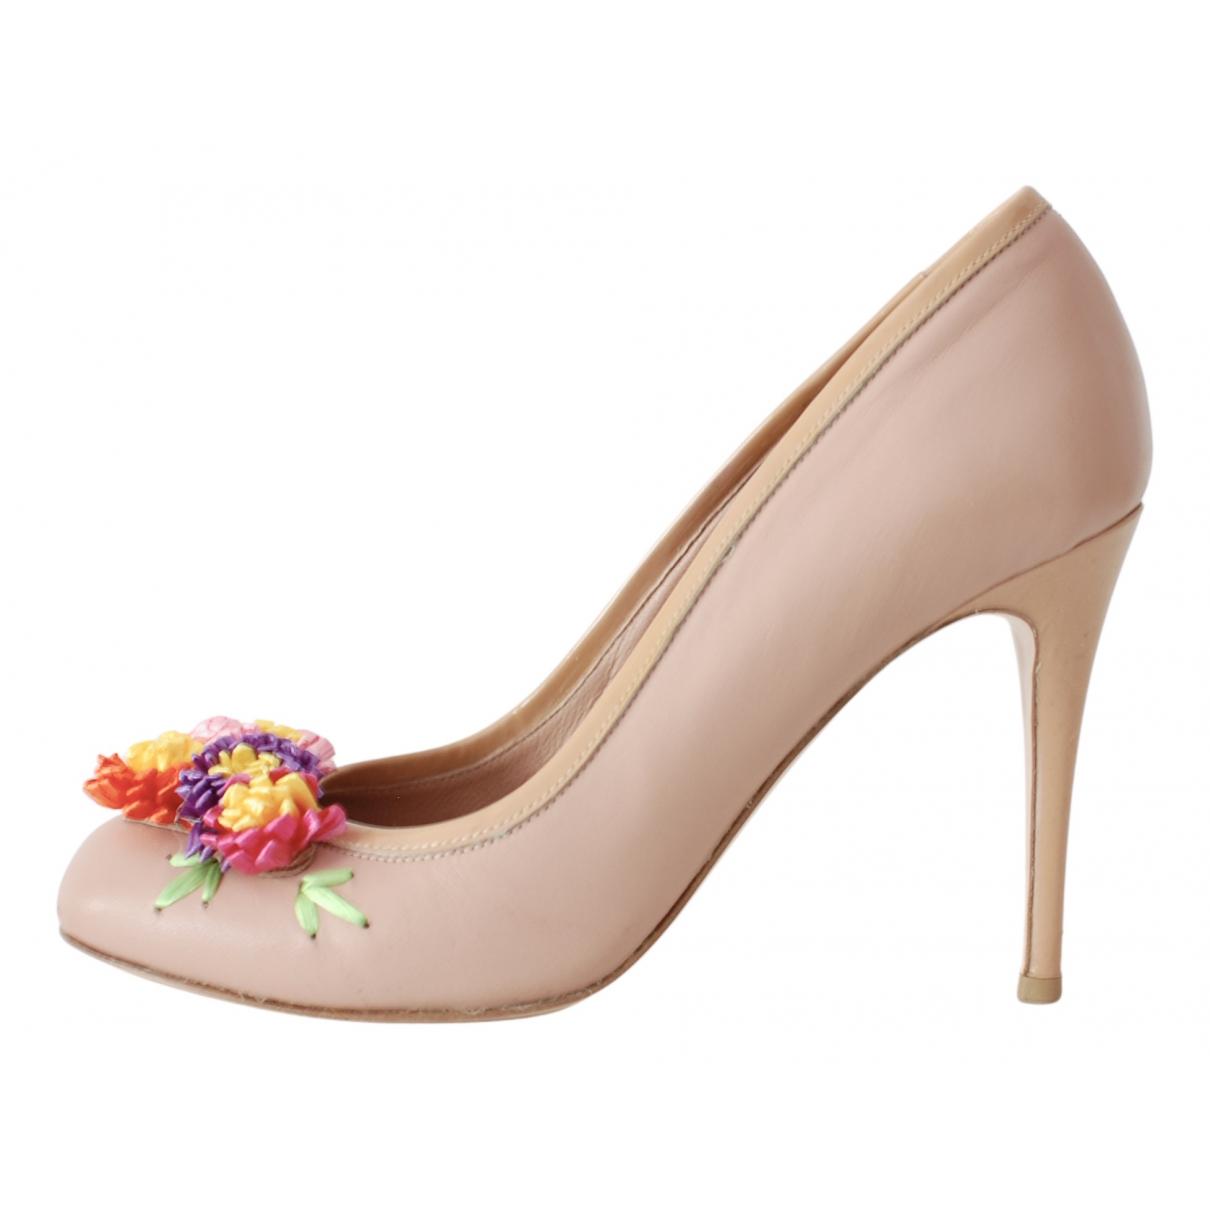 Valentino Garavani N Pink Leather Heels for Women 36 IT